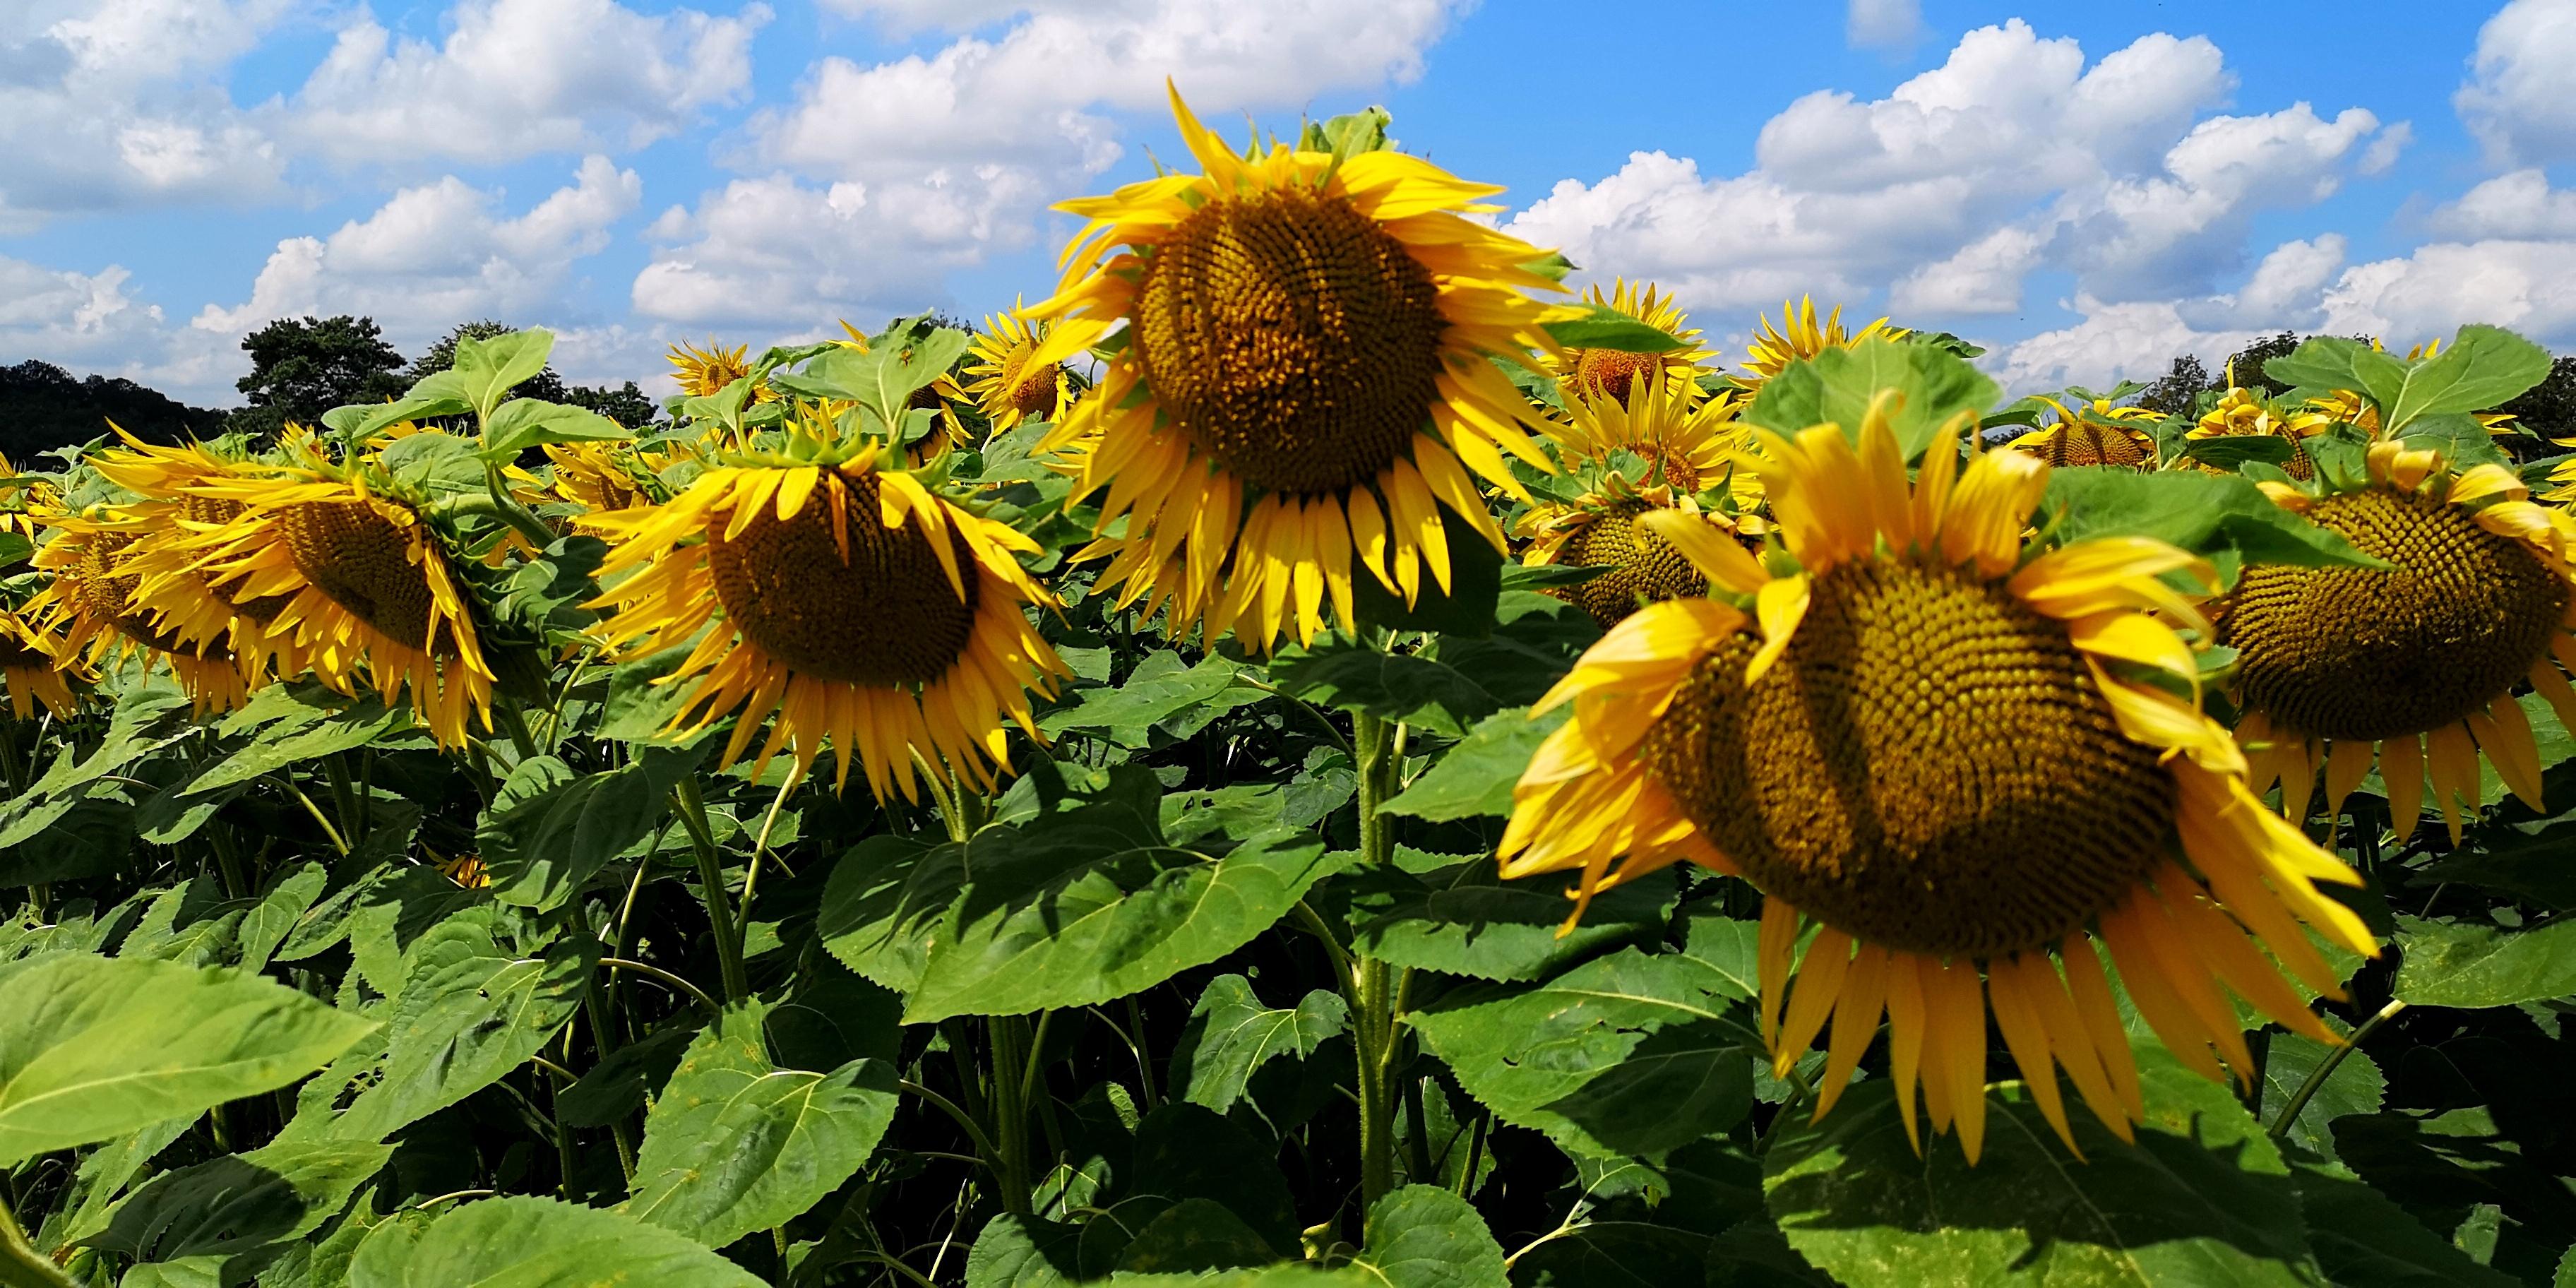 Sonnenblumenfeld am Müliberg. Beliebtes Anflugsziel meiner Bienen.